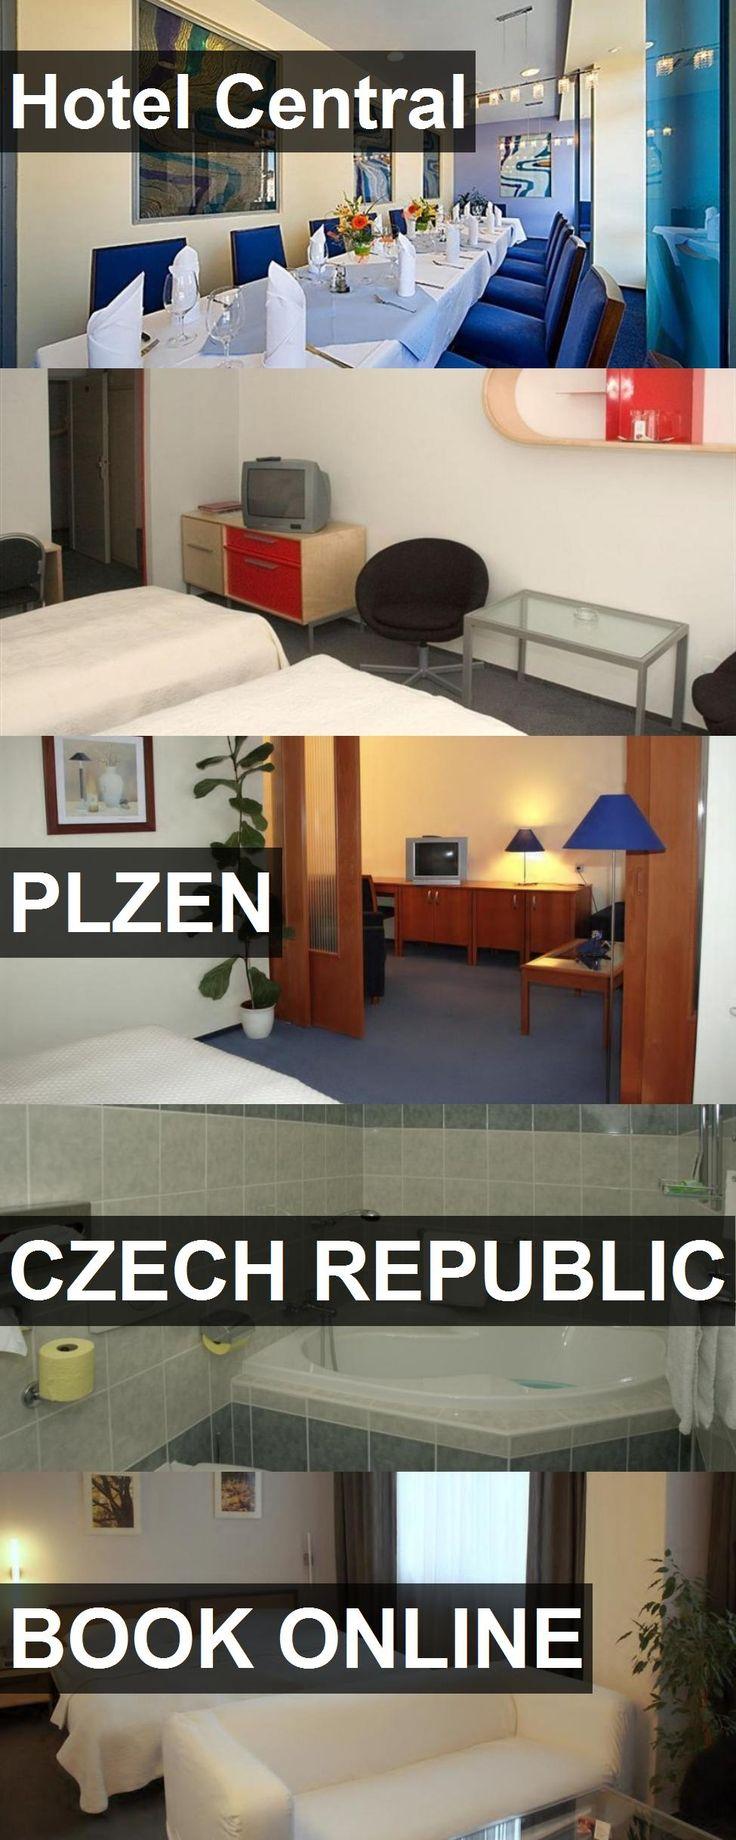 Hotel Central in Plzen, Czech Republic. For more information, photos, reviews and best prices please follow the link. #CzechRepublic #Plzen #travel #vacation #hotel